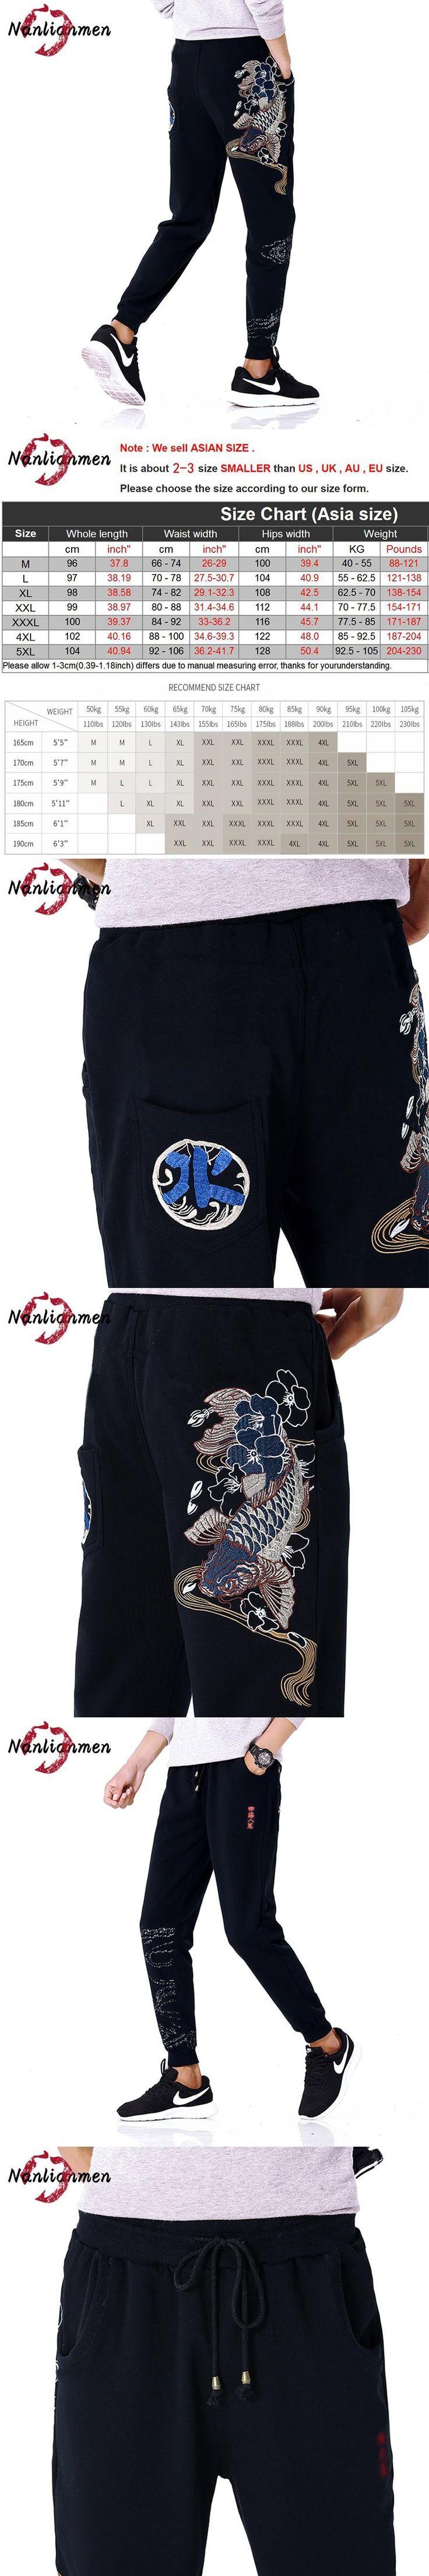 2017 New Chinese Style Carp Embroidery Casual Pants Men trousers men's Joggers pantalon hombre Male Sweatpants pantalon chandal